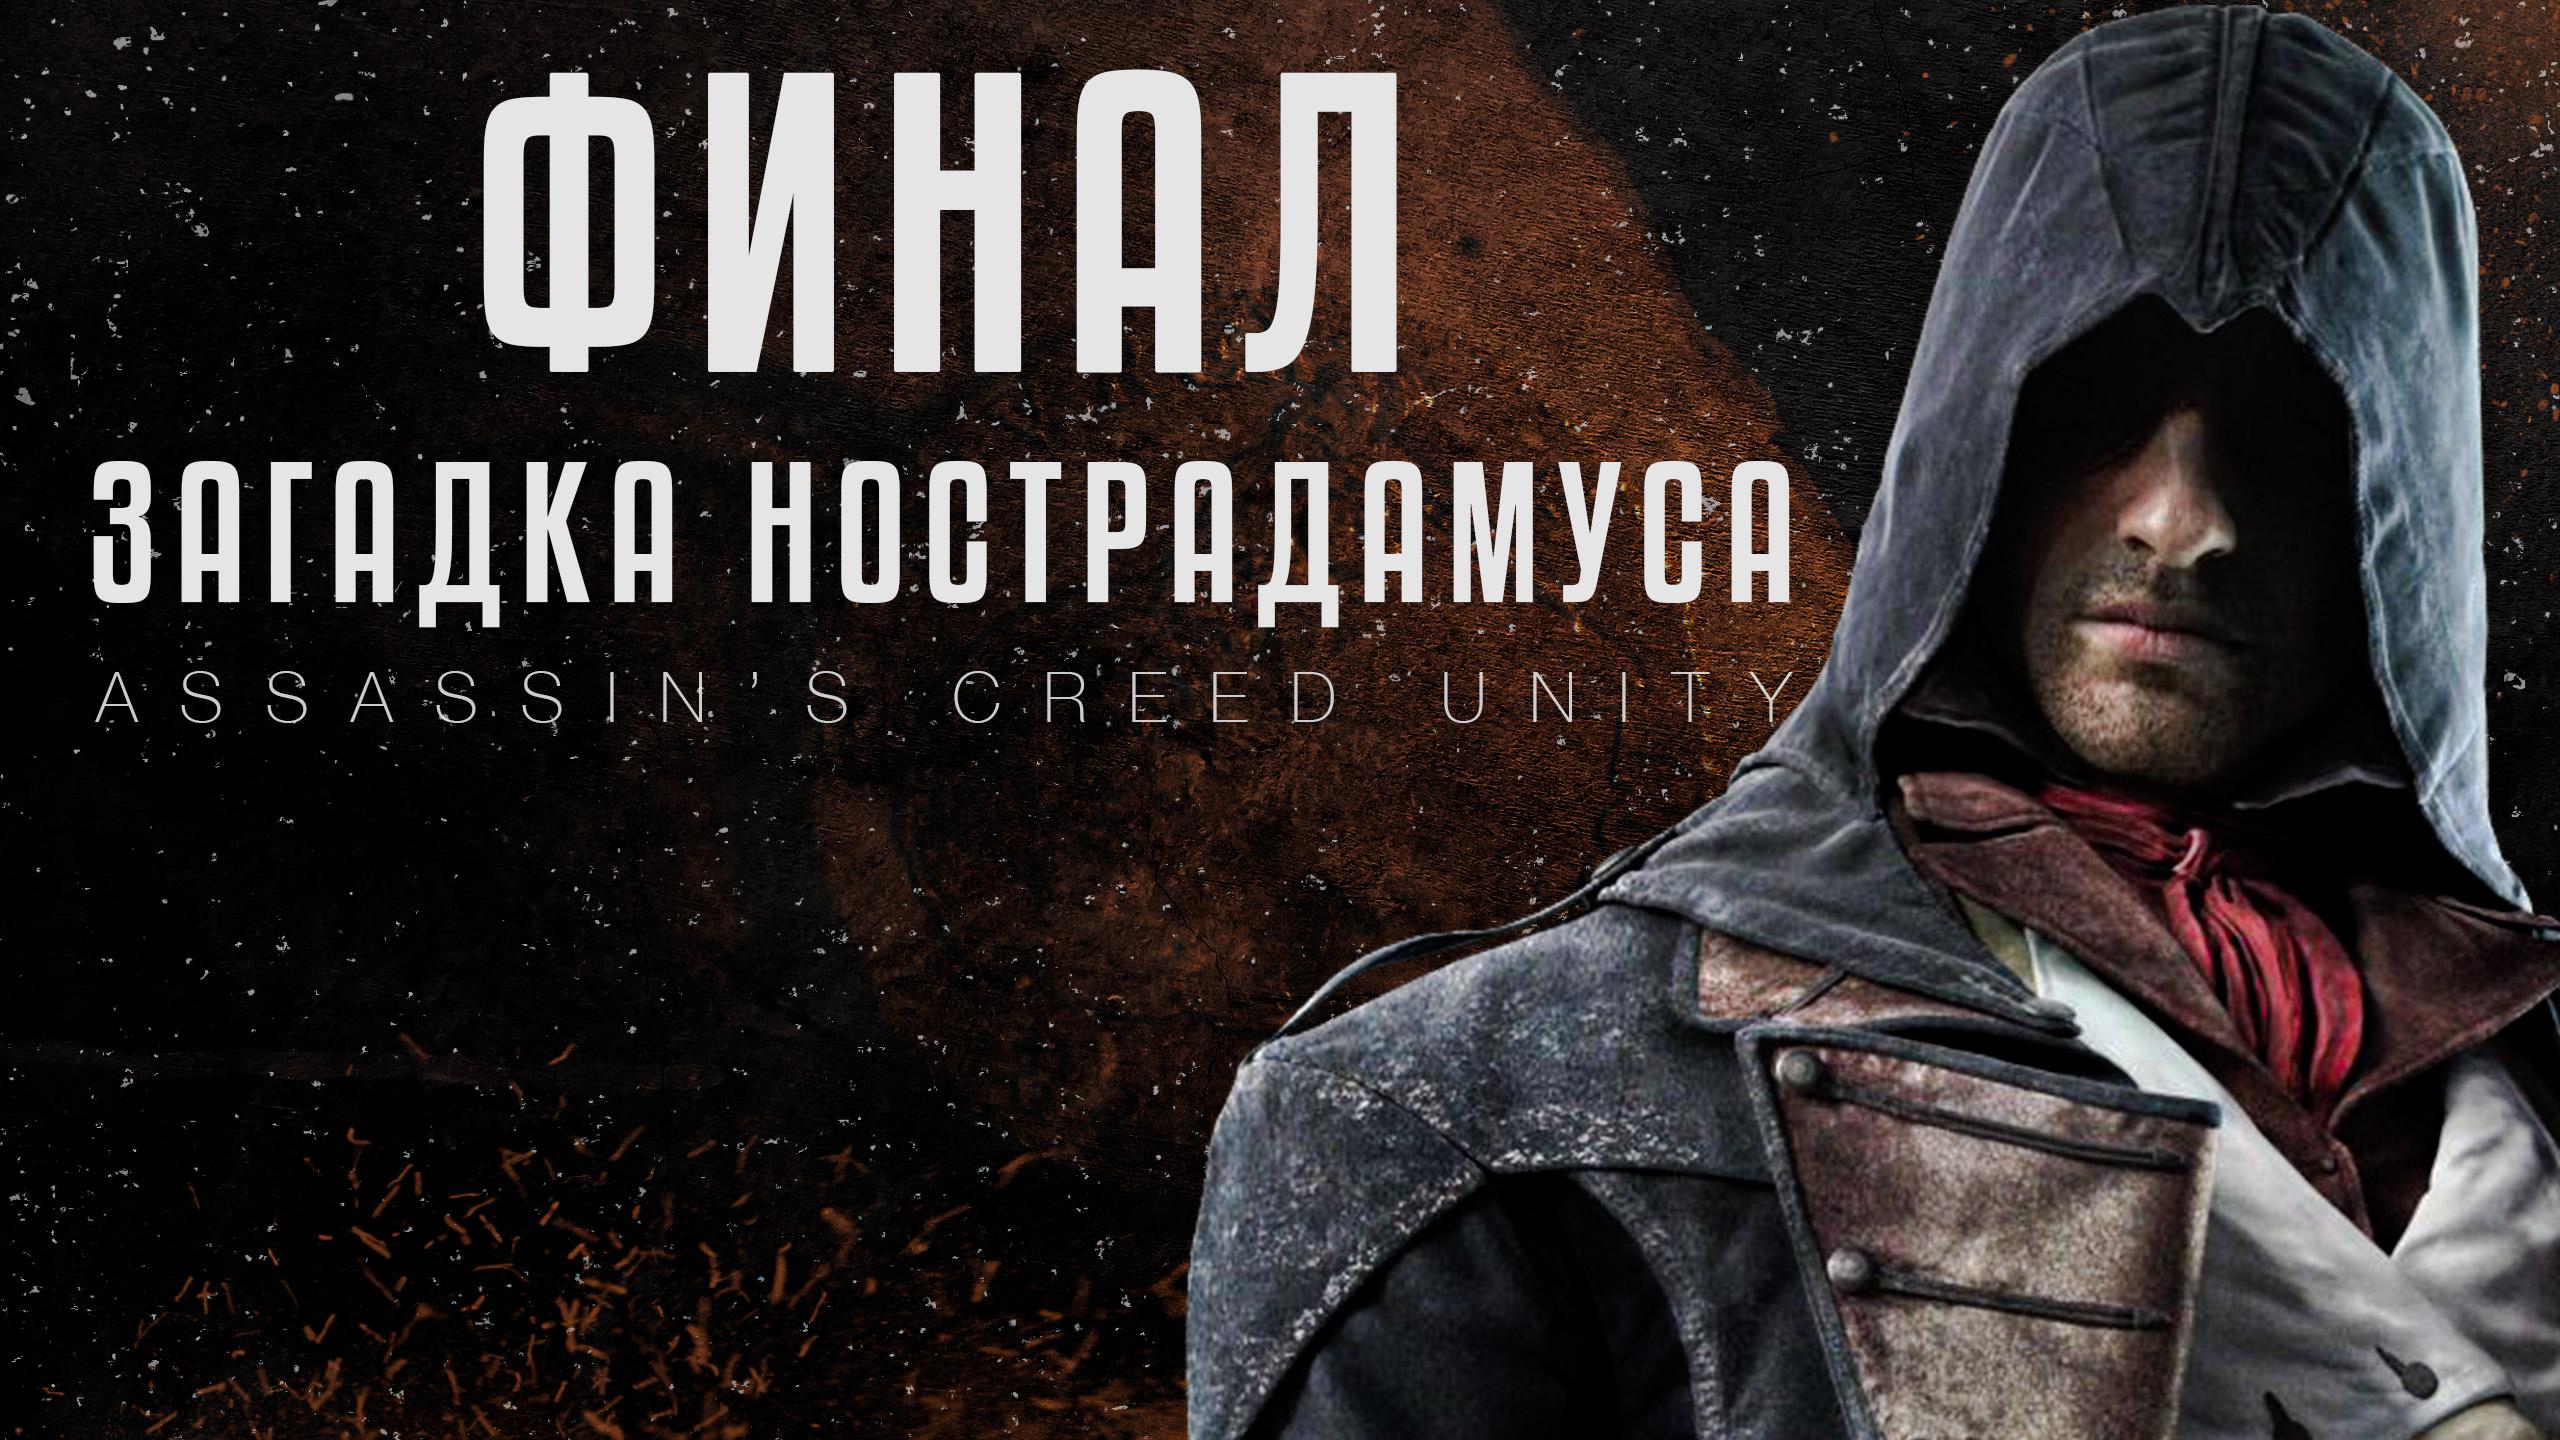 Нострадамус в игре Assassin's Creed Unity (Финал)